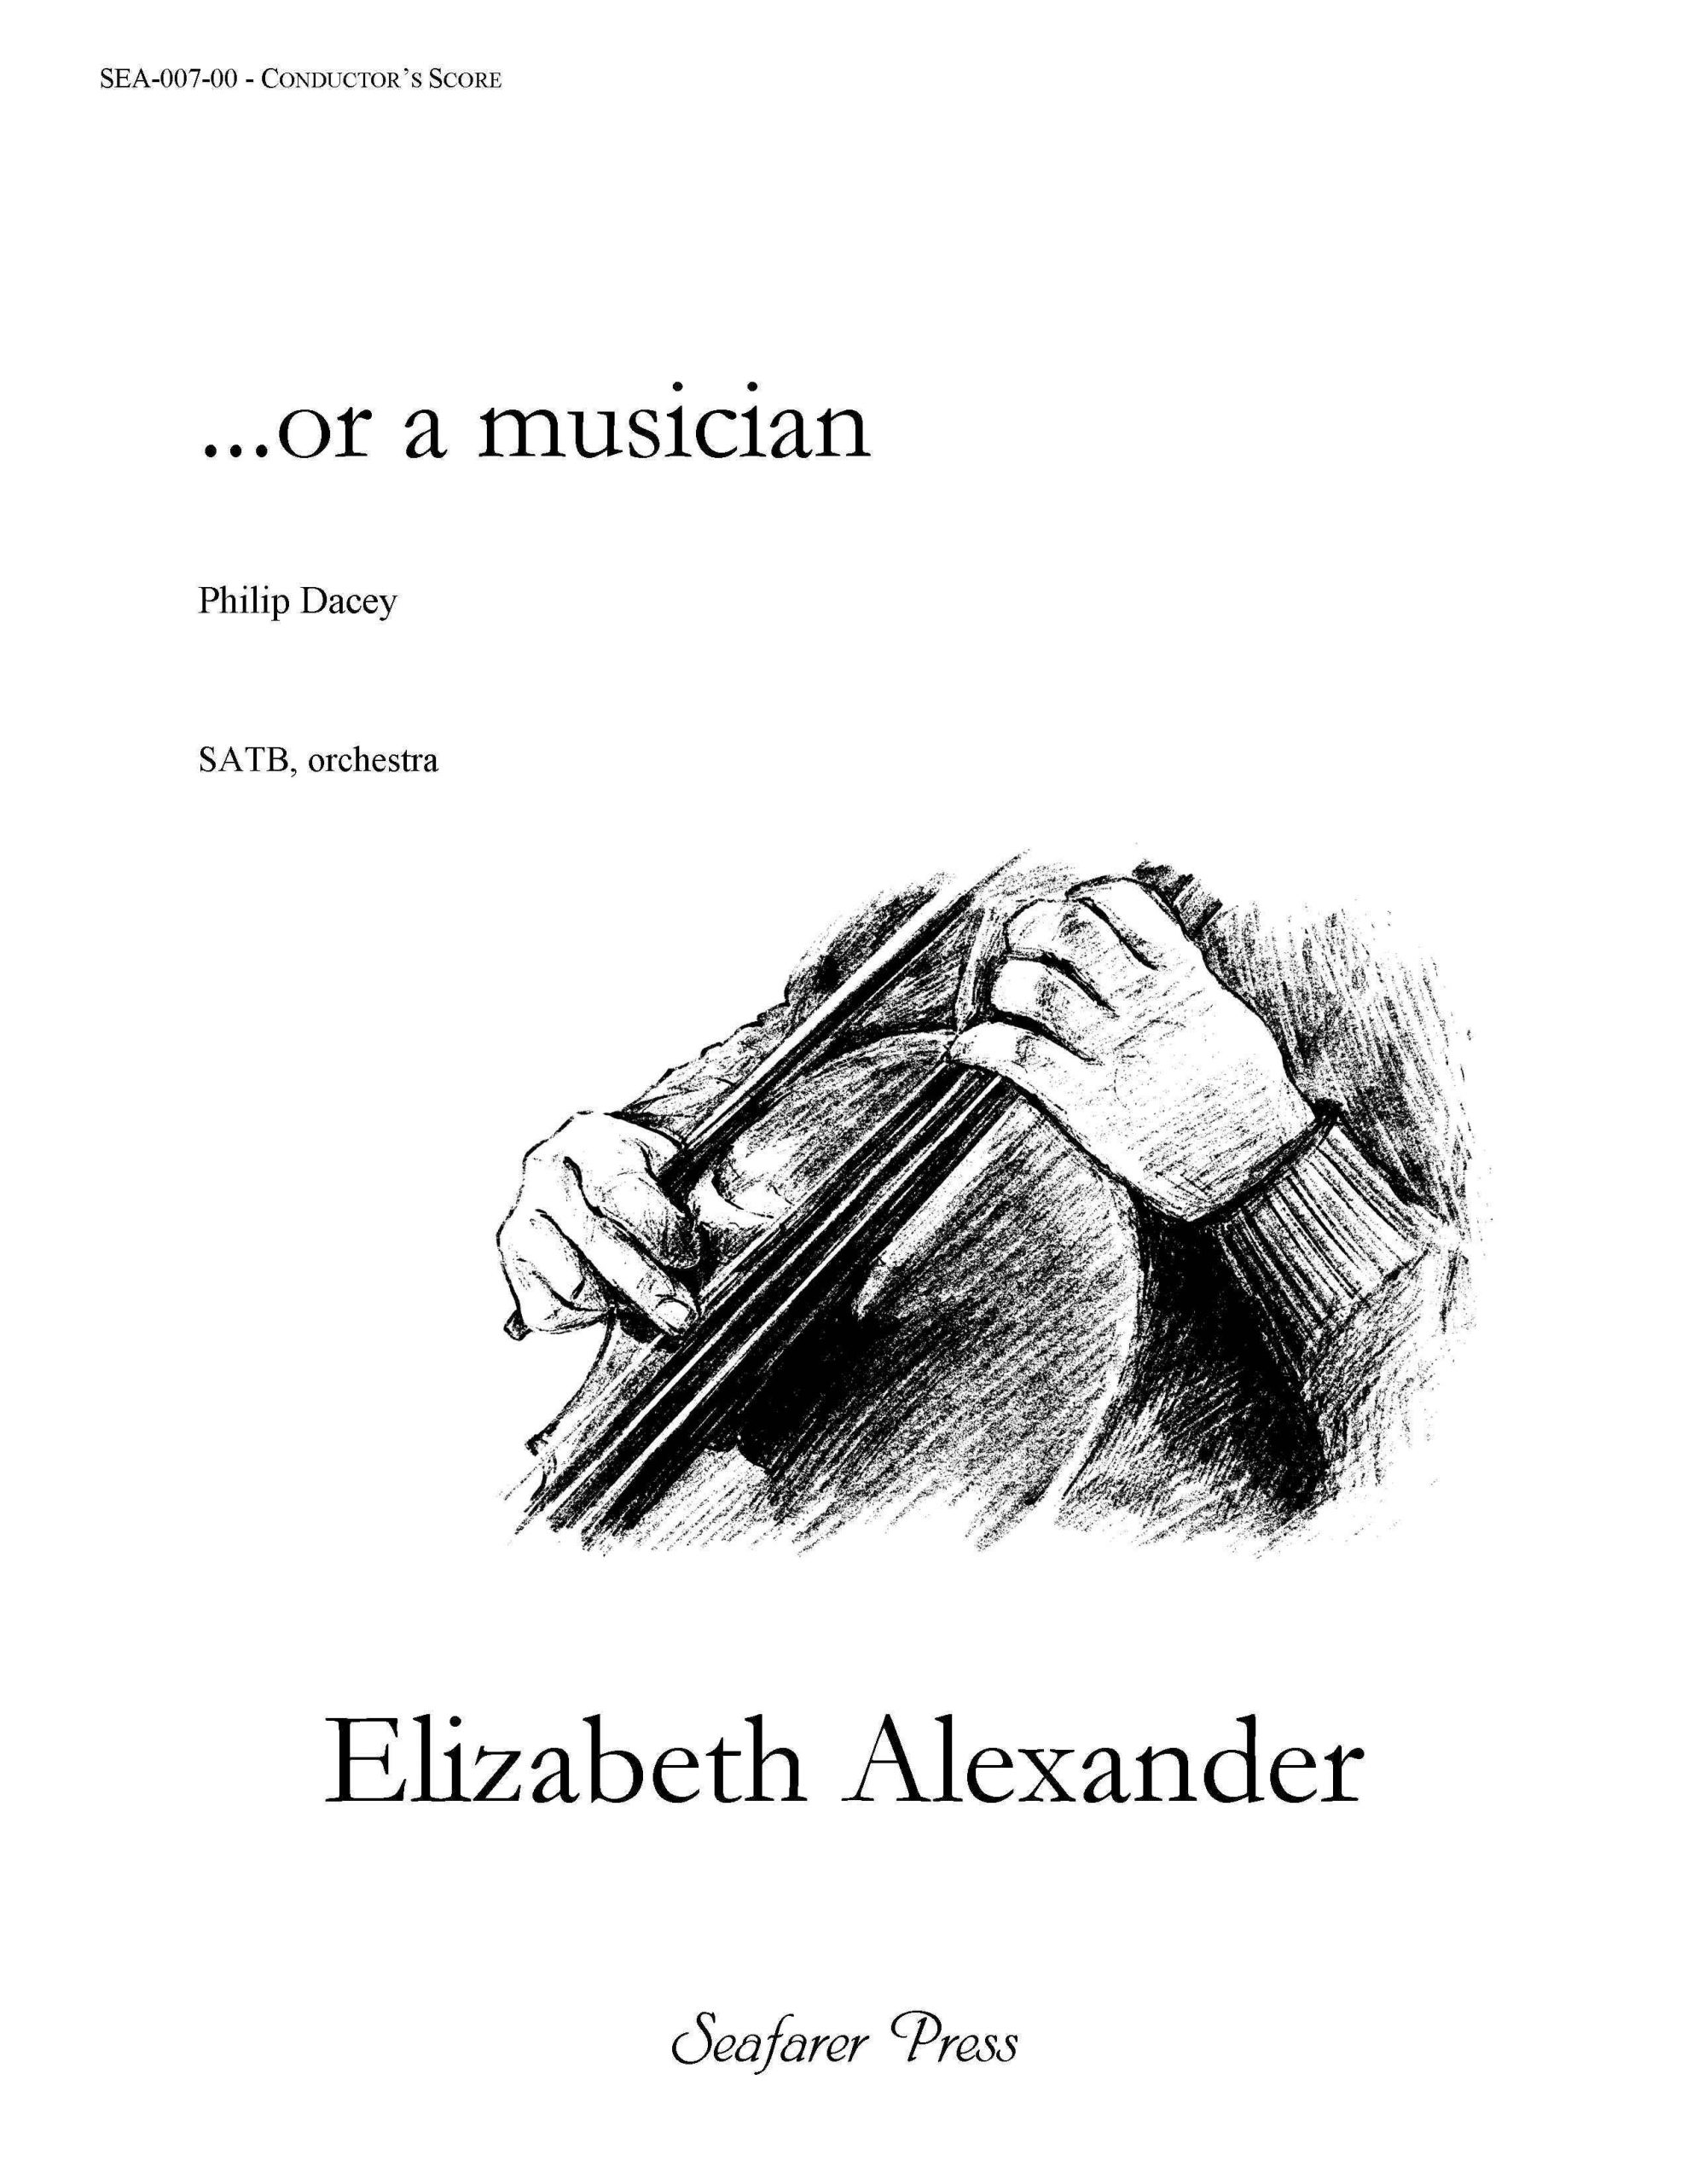 SEA-007-00 - ...or a musician